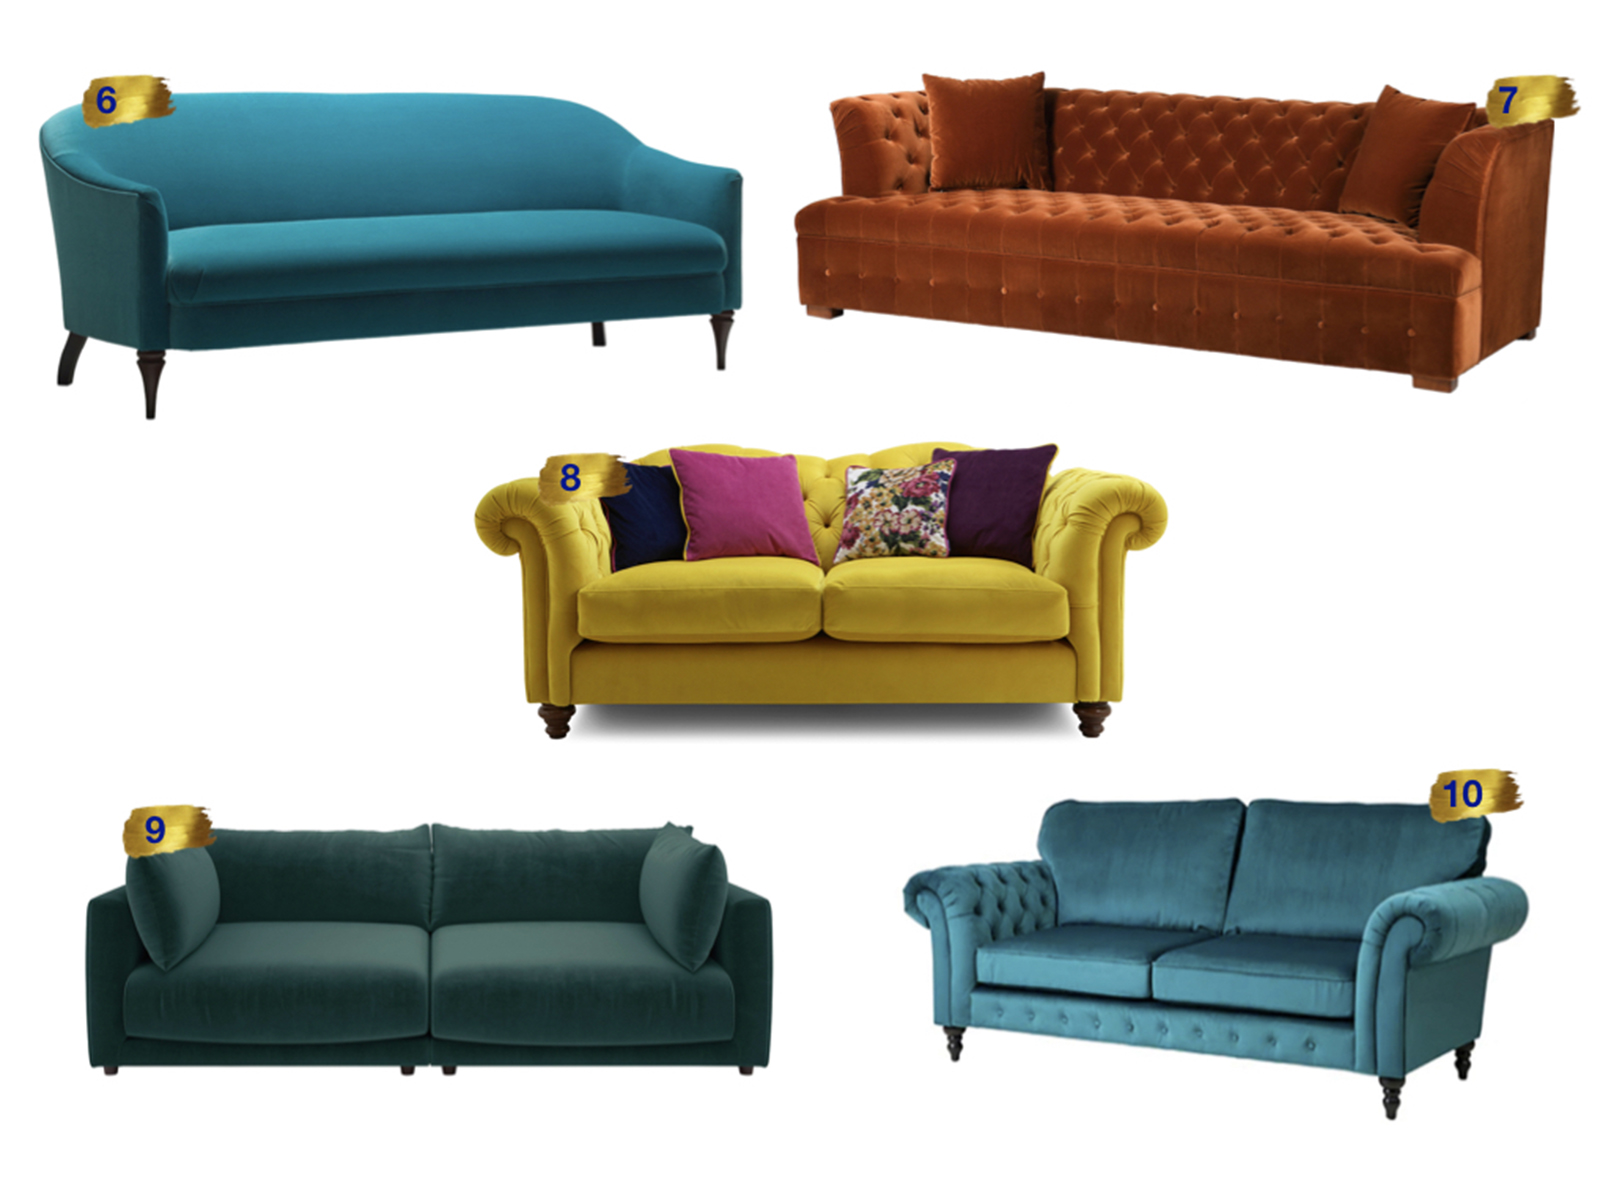 Should You Buy A Velvet Sofa Sophie Robinson